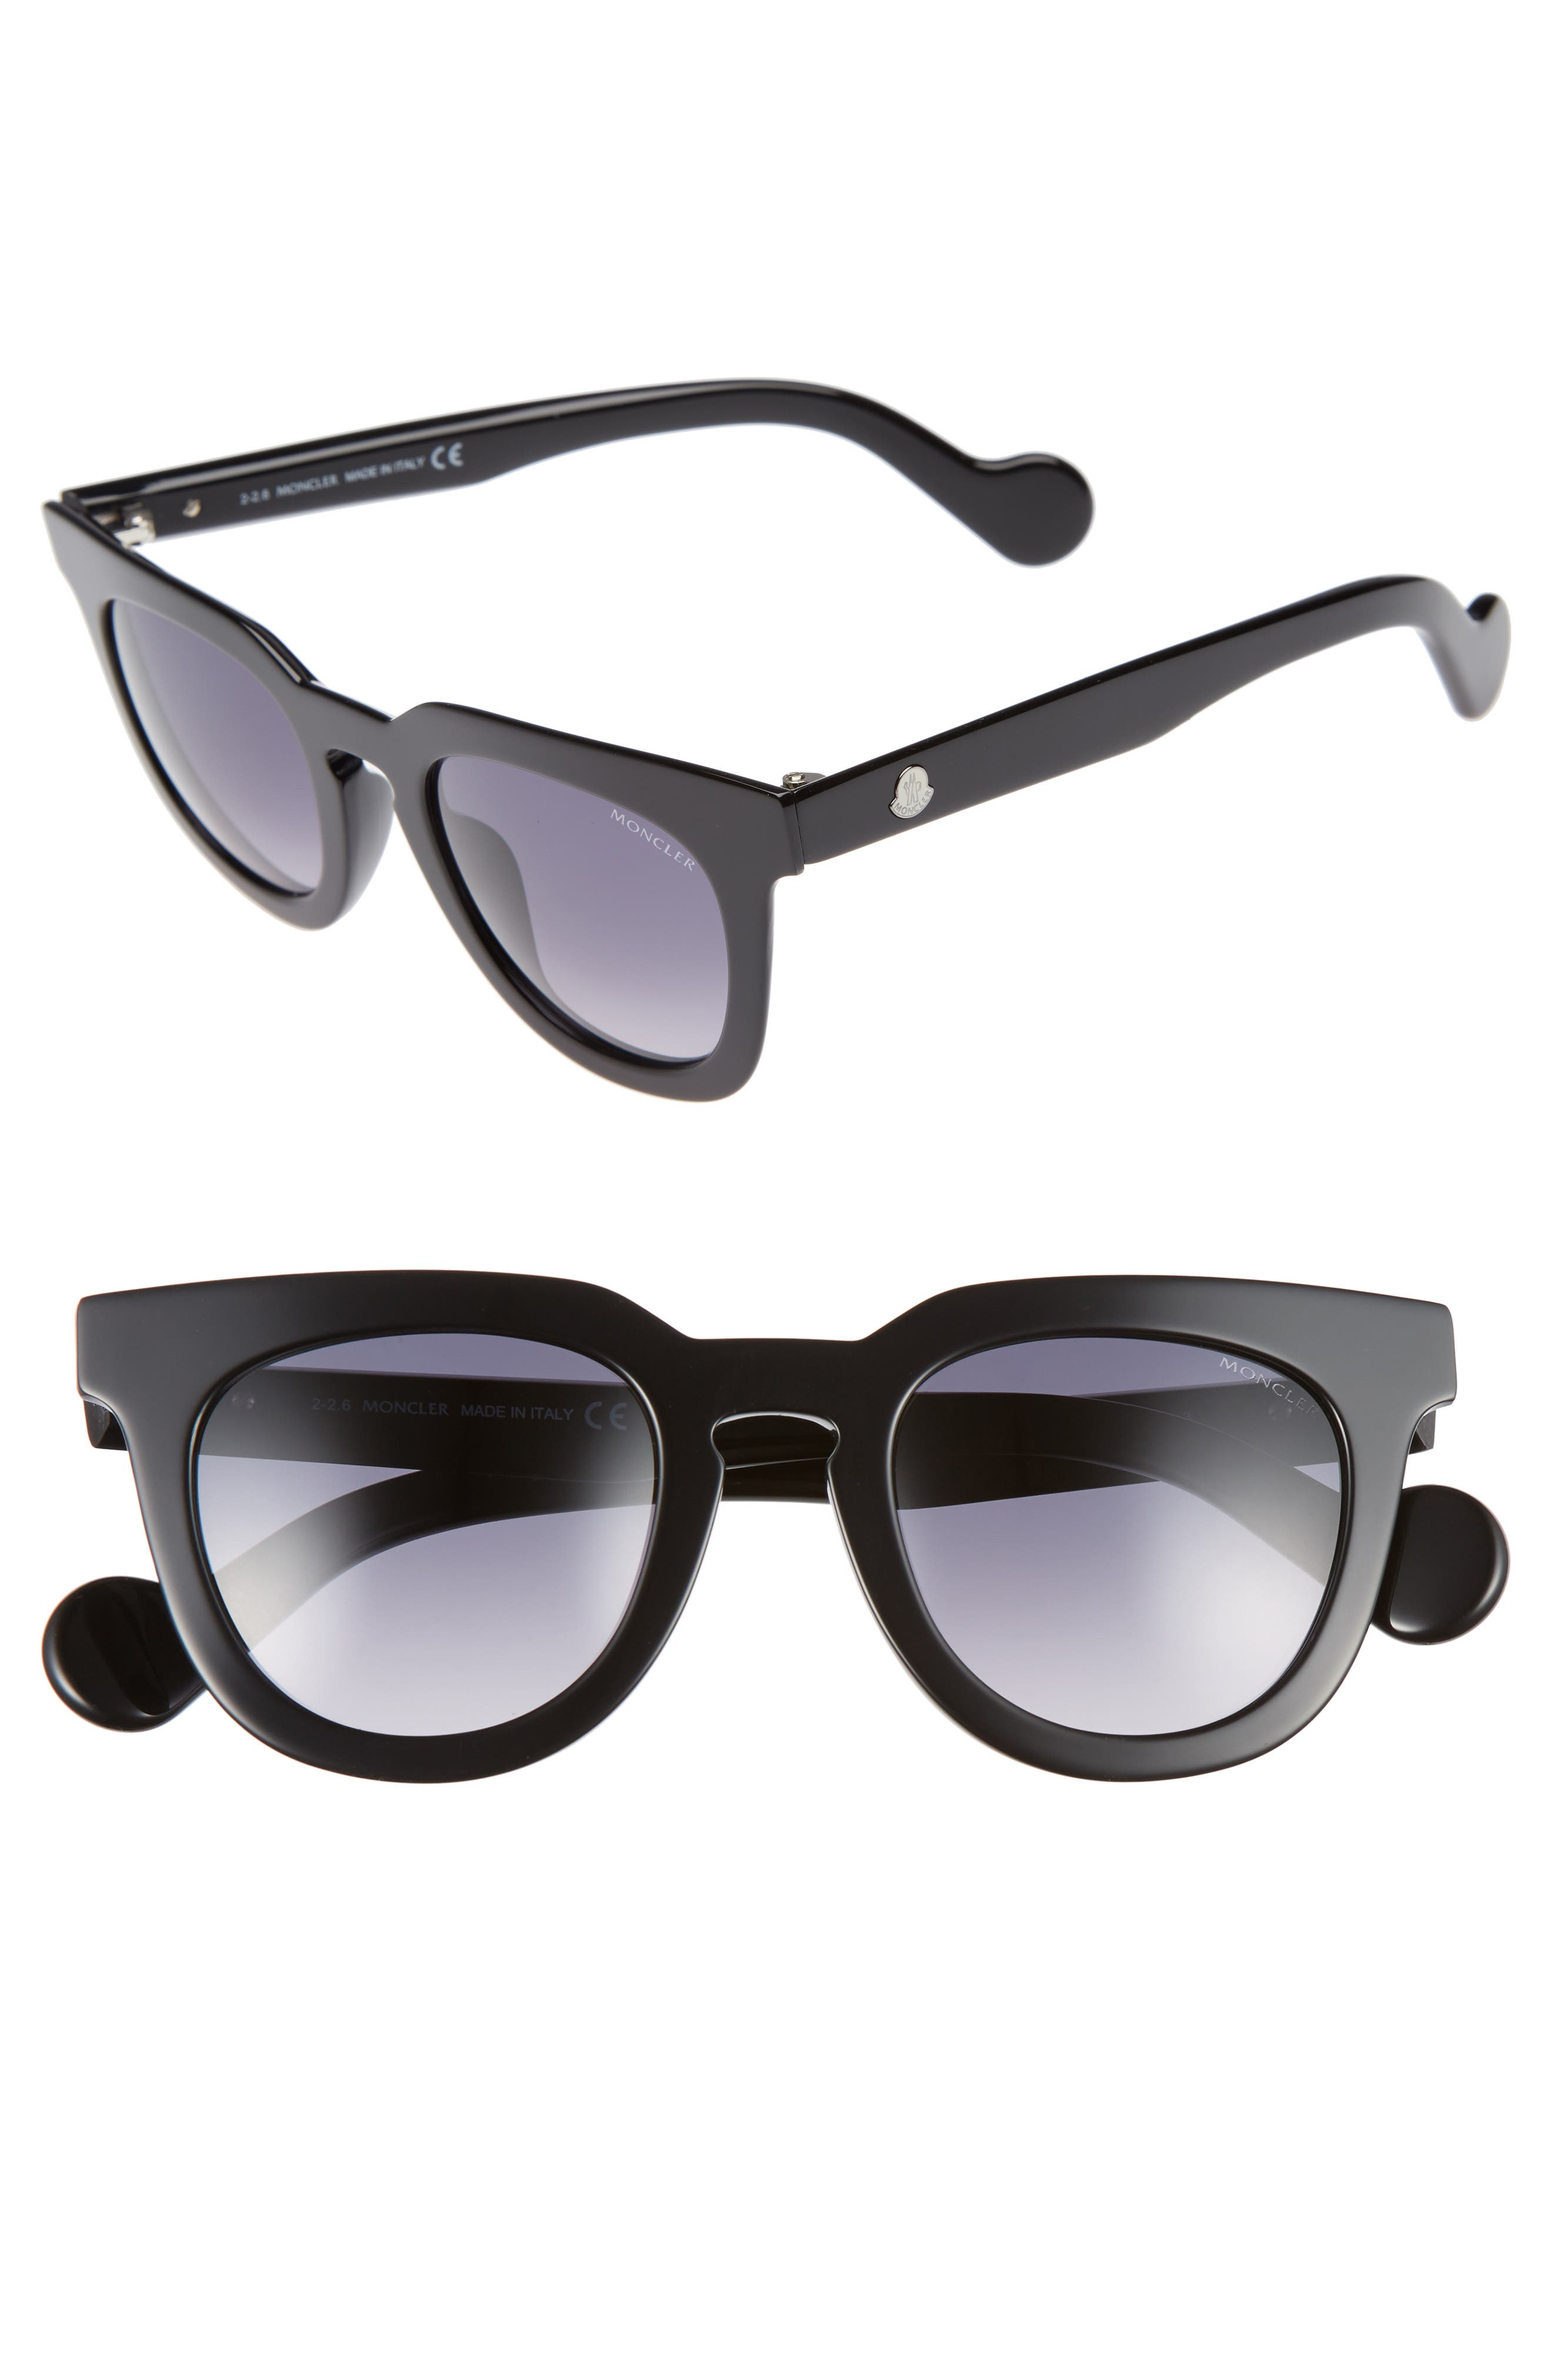 48mm Retro Sunglasses,                             Main thumbnail 1, color,                             001